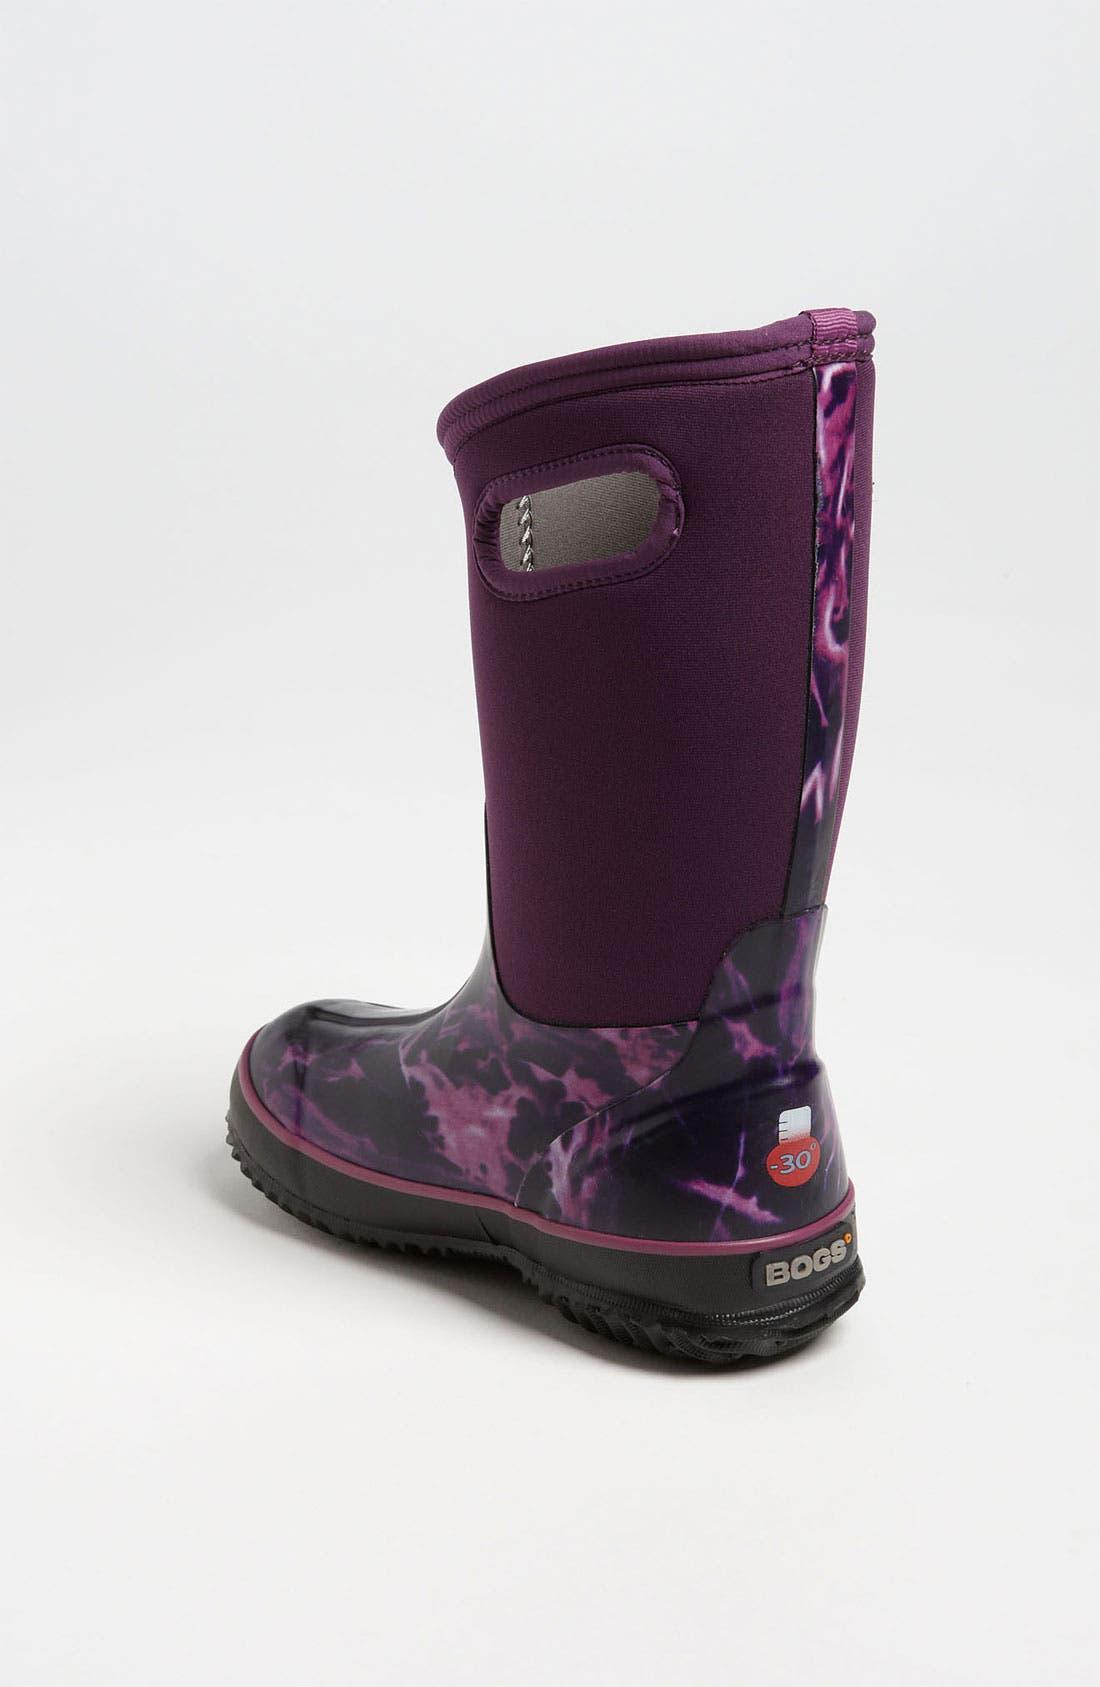 Alternate Image 2  - Bogs 'Classic High - Batik' Waterproof Boot (Toddler, Little Kid & Big Kid)